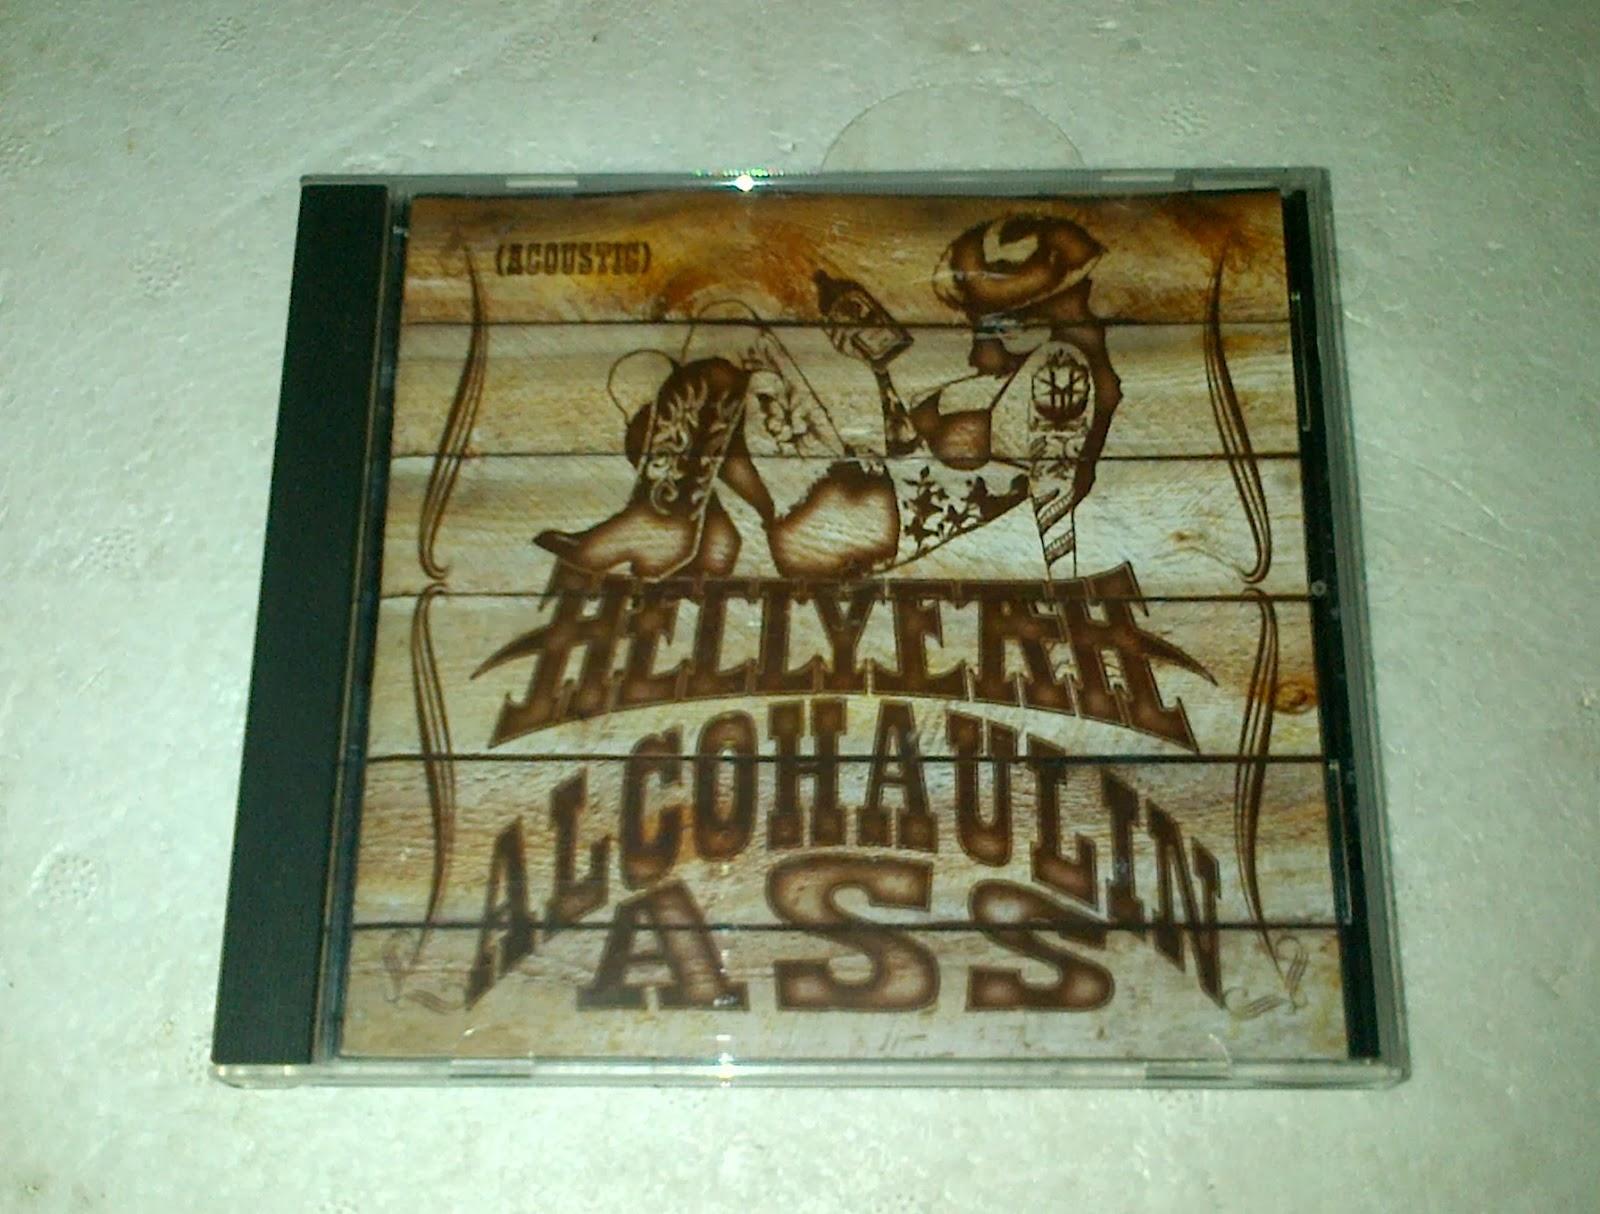 Alcohaulin Ass Acoustic 49